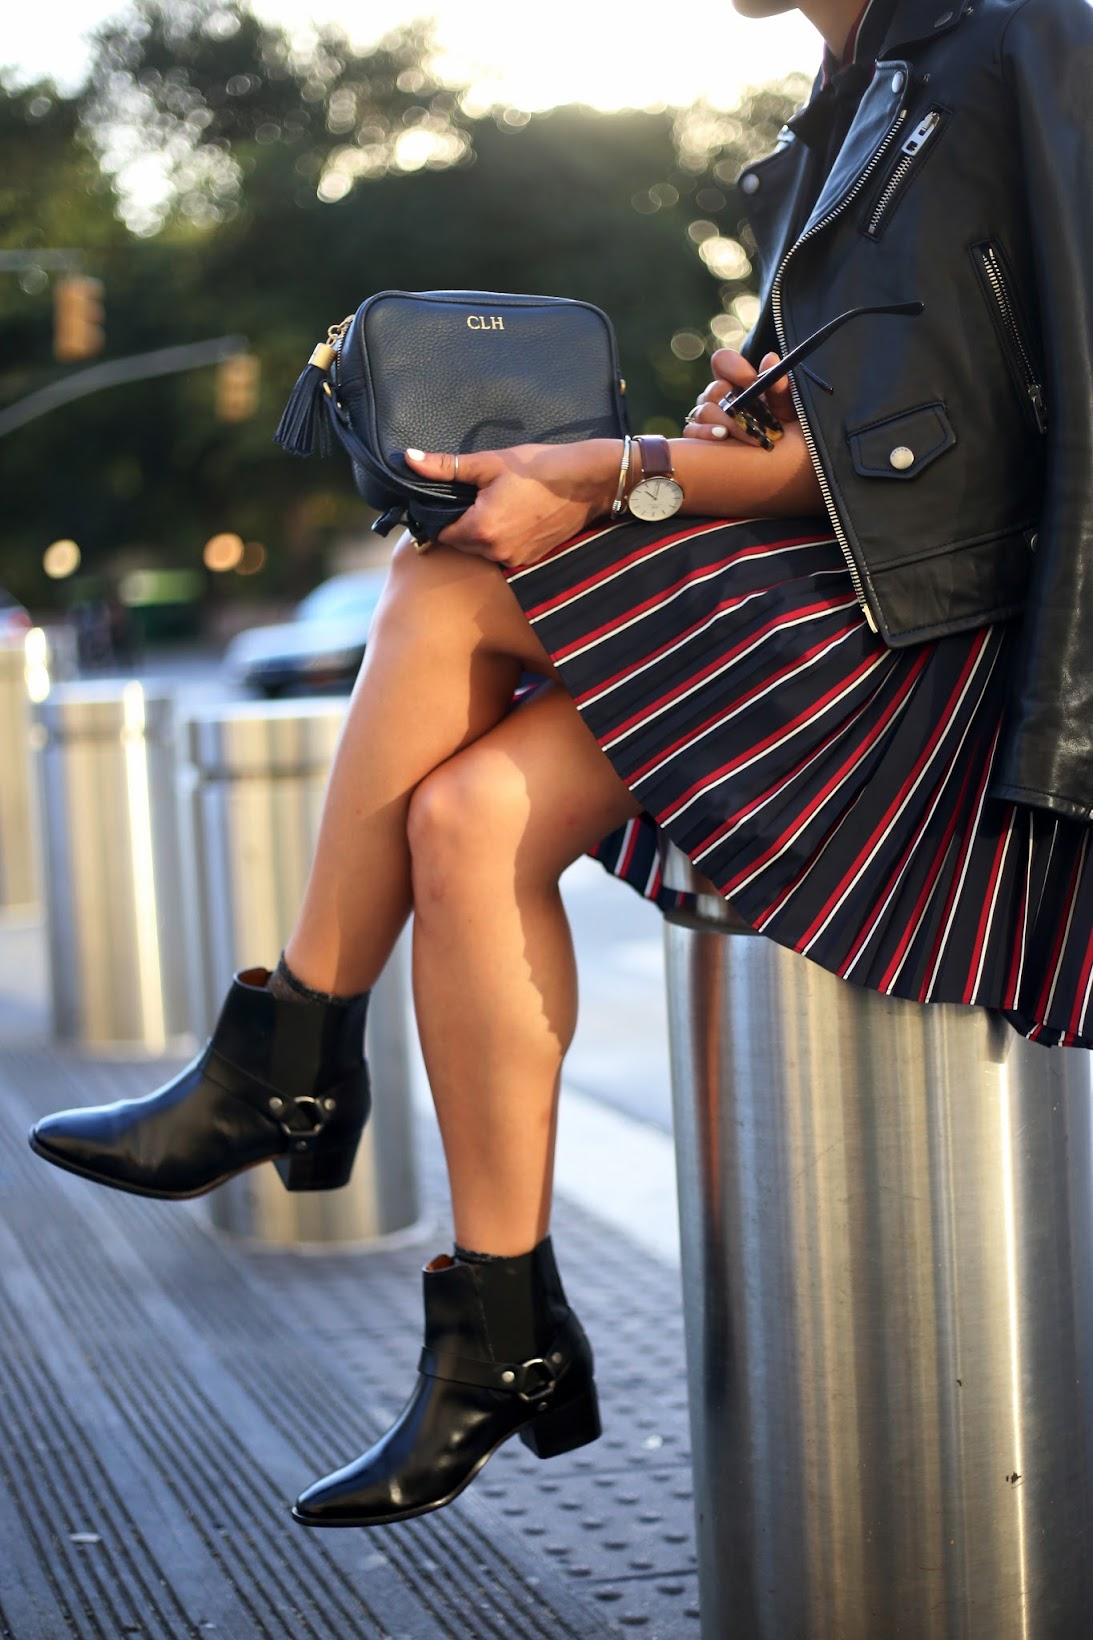 NYFW, NYC, all stripes, Banana Republic, It's Banana, stripes, Fall fashion, fall outfit, Gigi New york, hoop earrings, Frye harness boots, Frye Dara Harness Chelsea boot